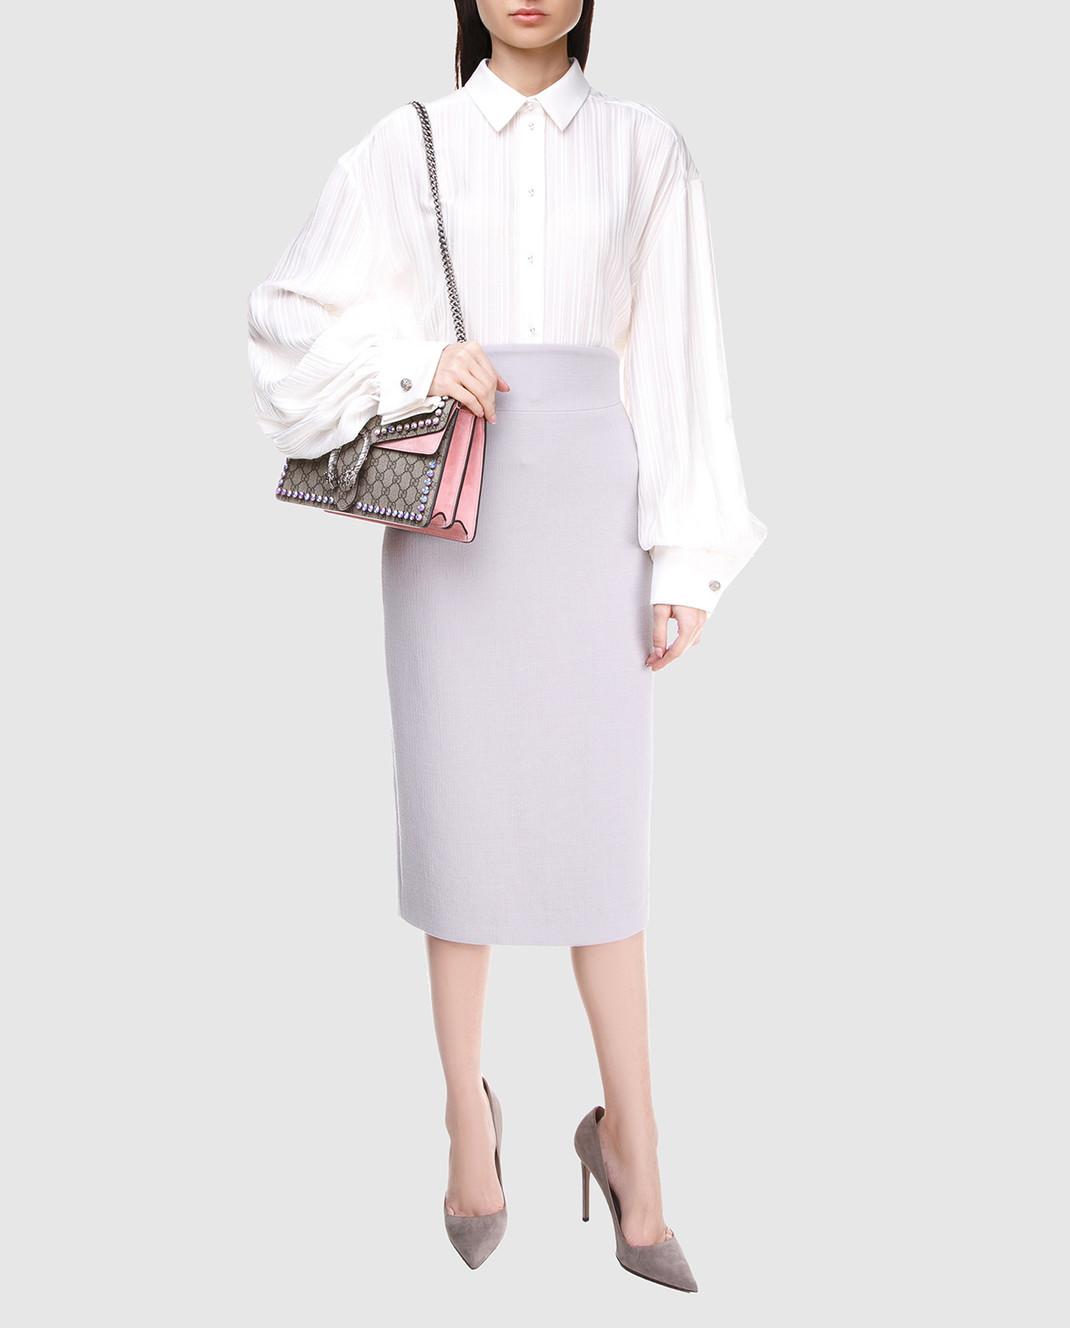 A la Russe Светло-серая юбка 371004 изображение 2